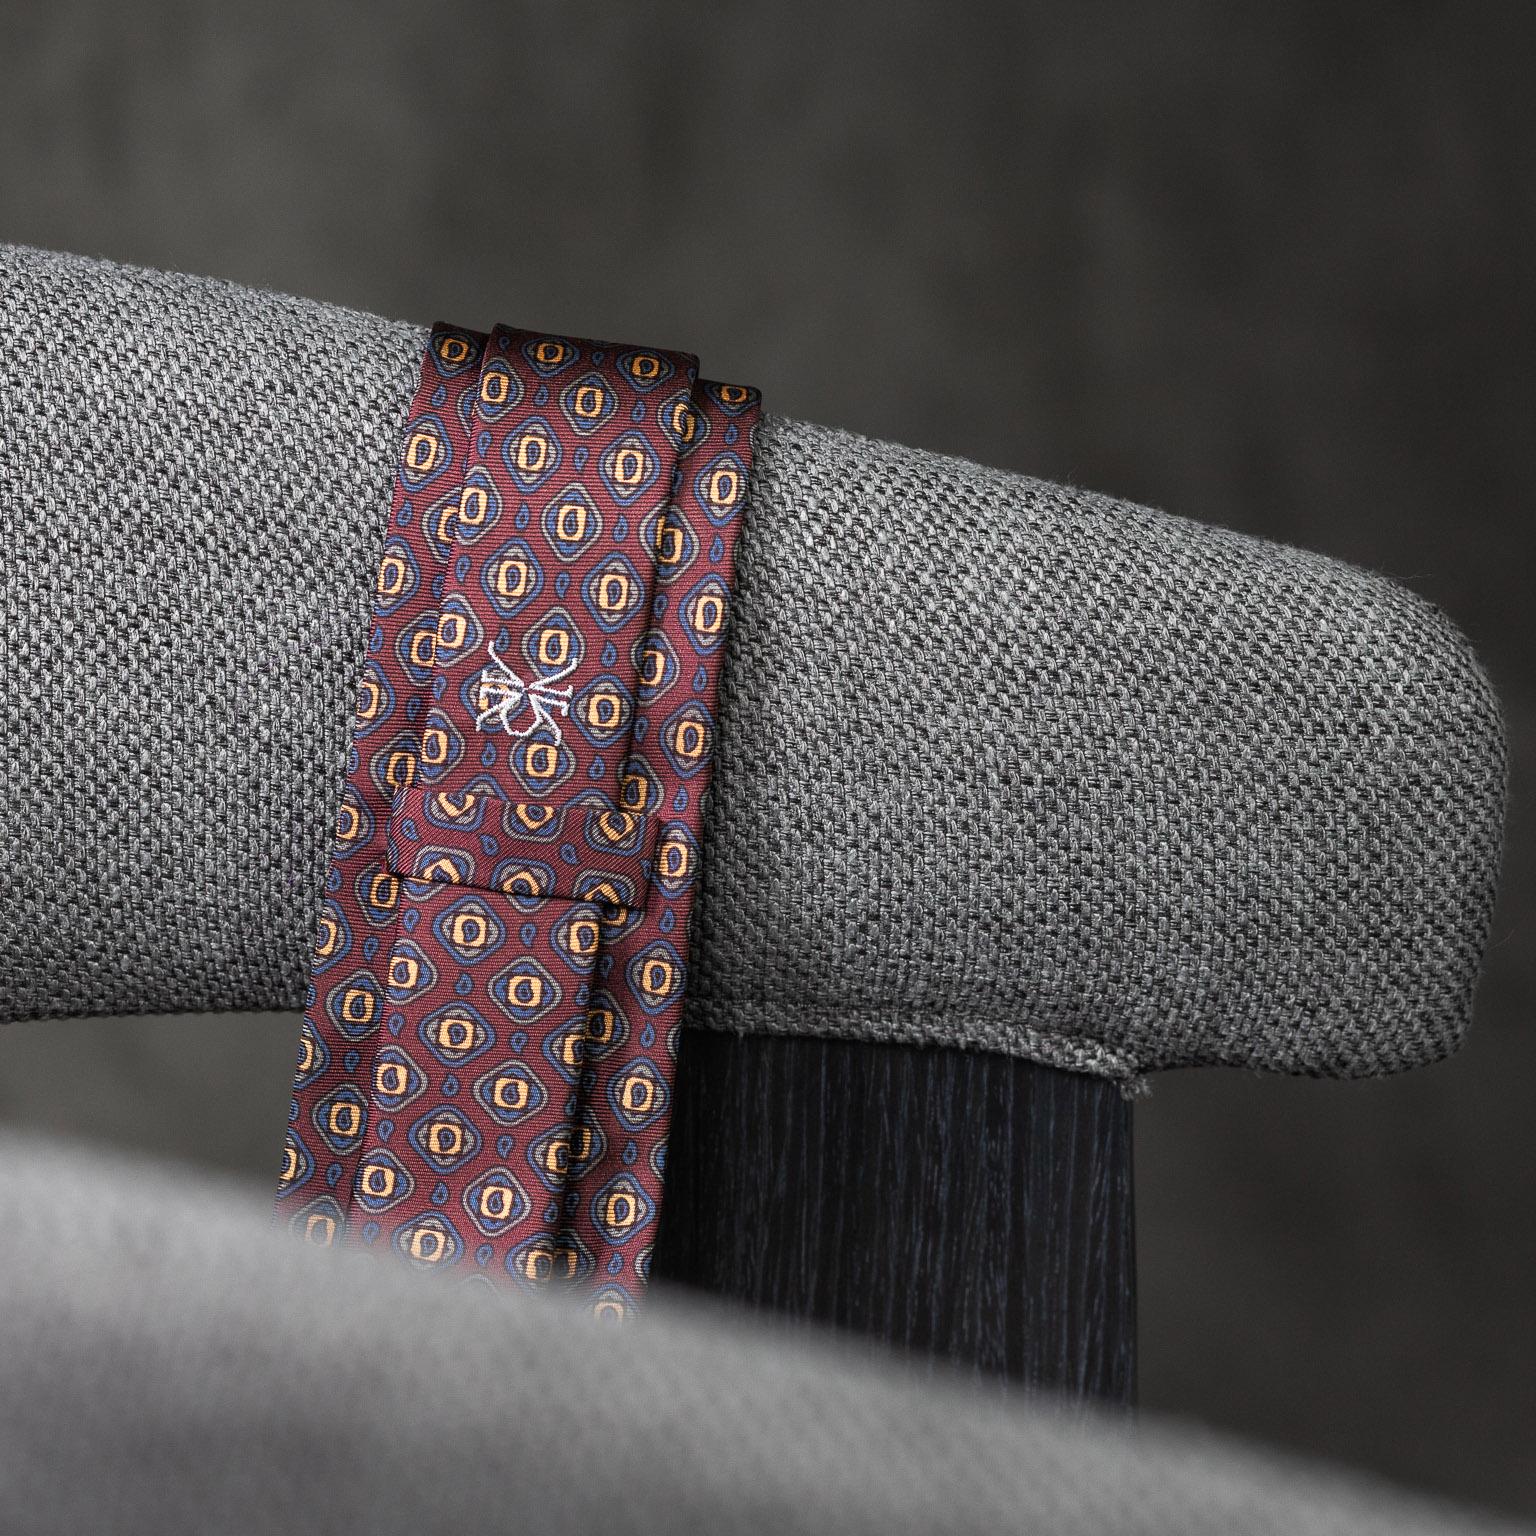 PRINTED-SILK-SEDA-ESTAMPADA-0578-Tie-Initials-Corbata-Iniciales-The-Seelk-4